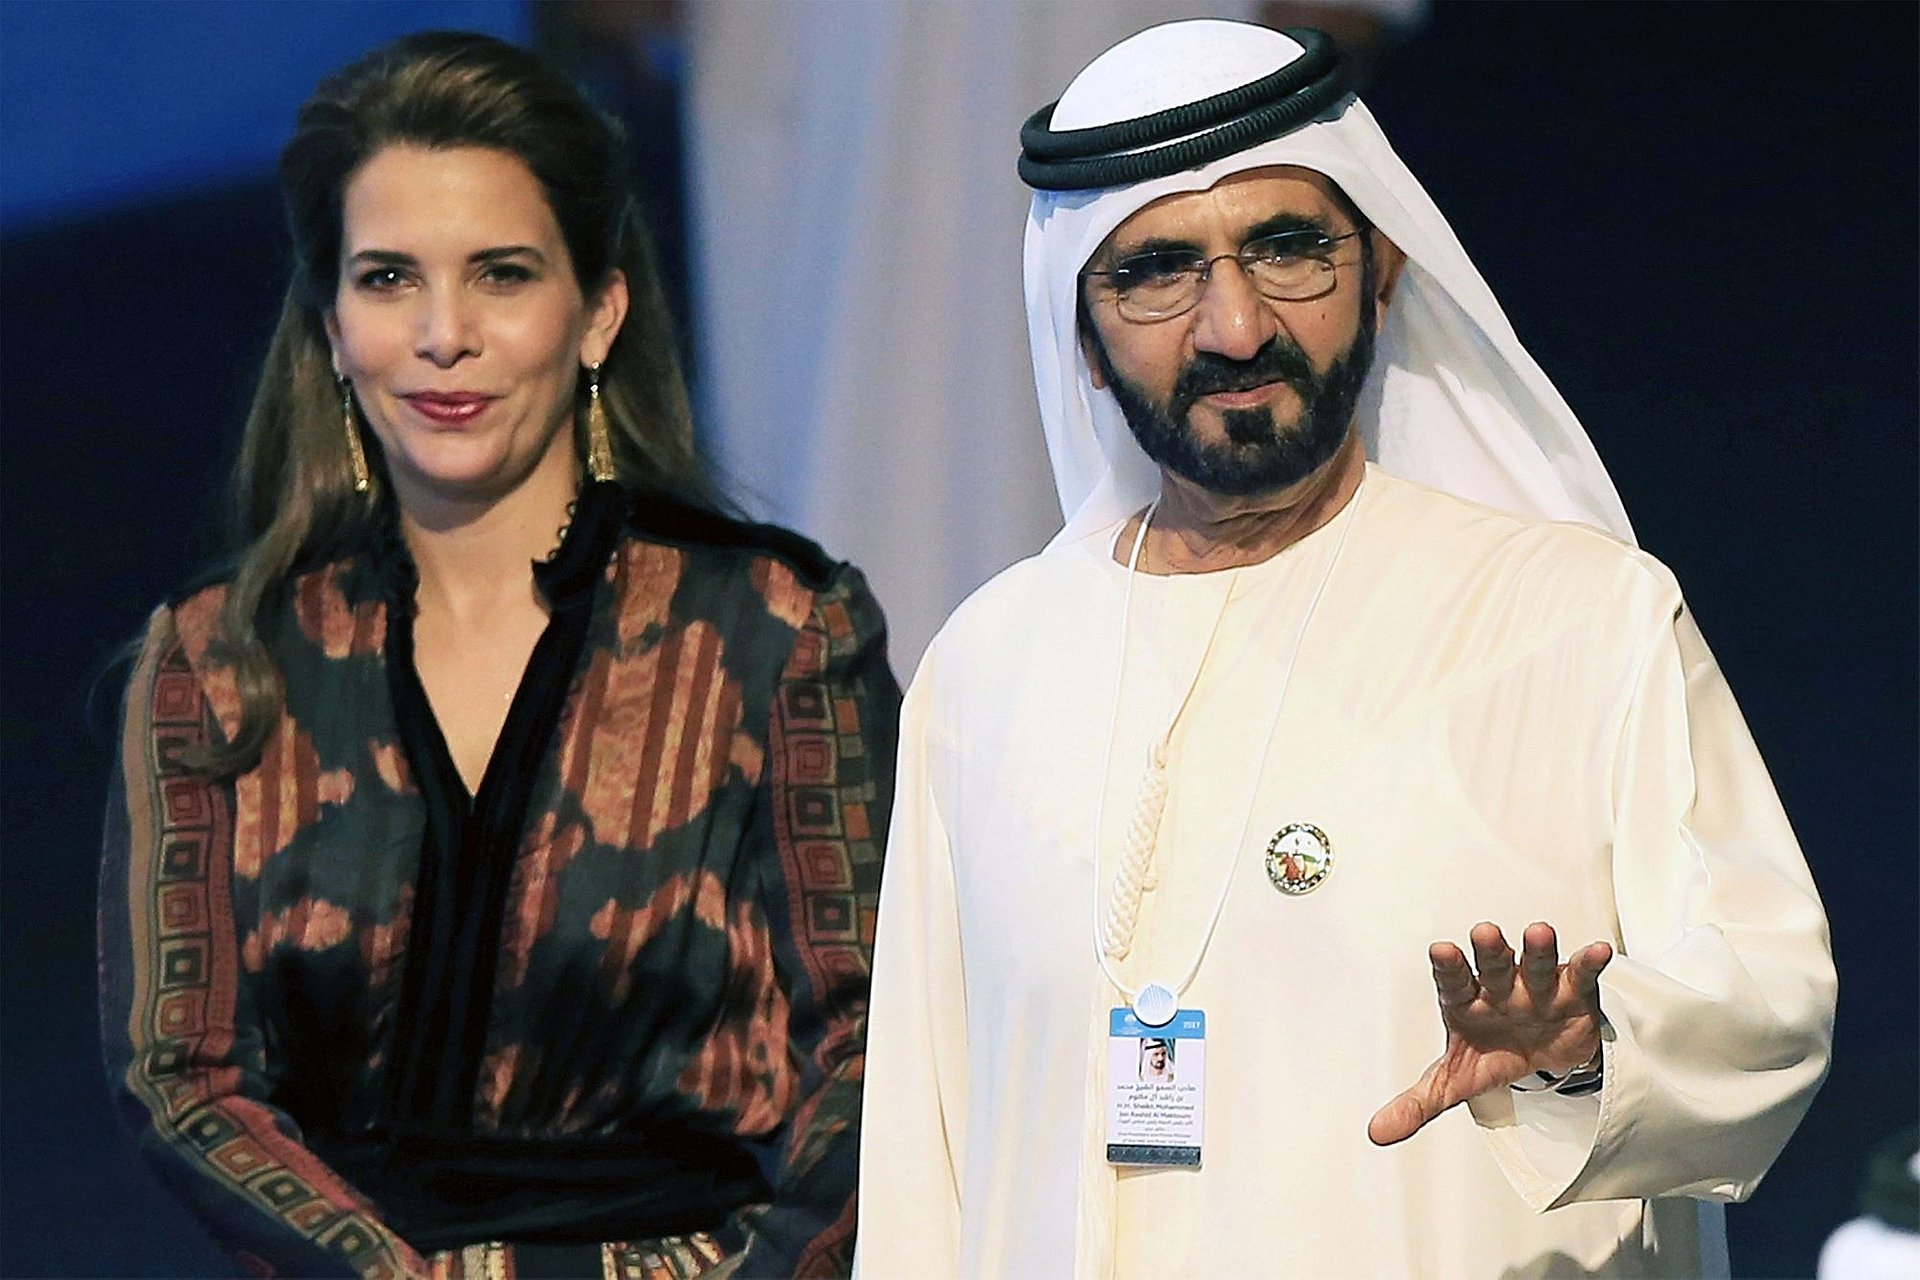 Princess Latifa Safety Central to Princess Haya's Custody Case says QC